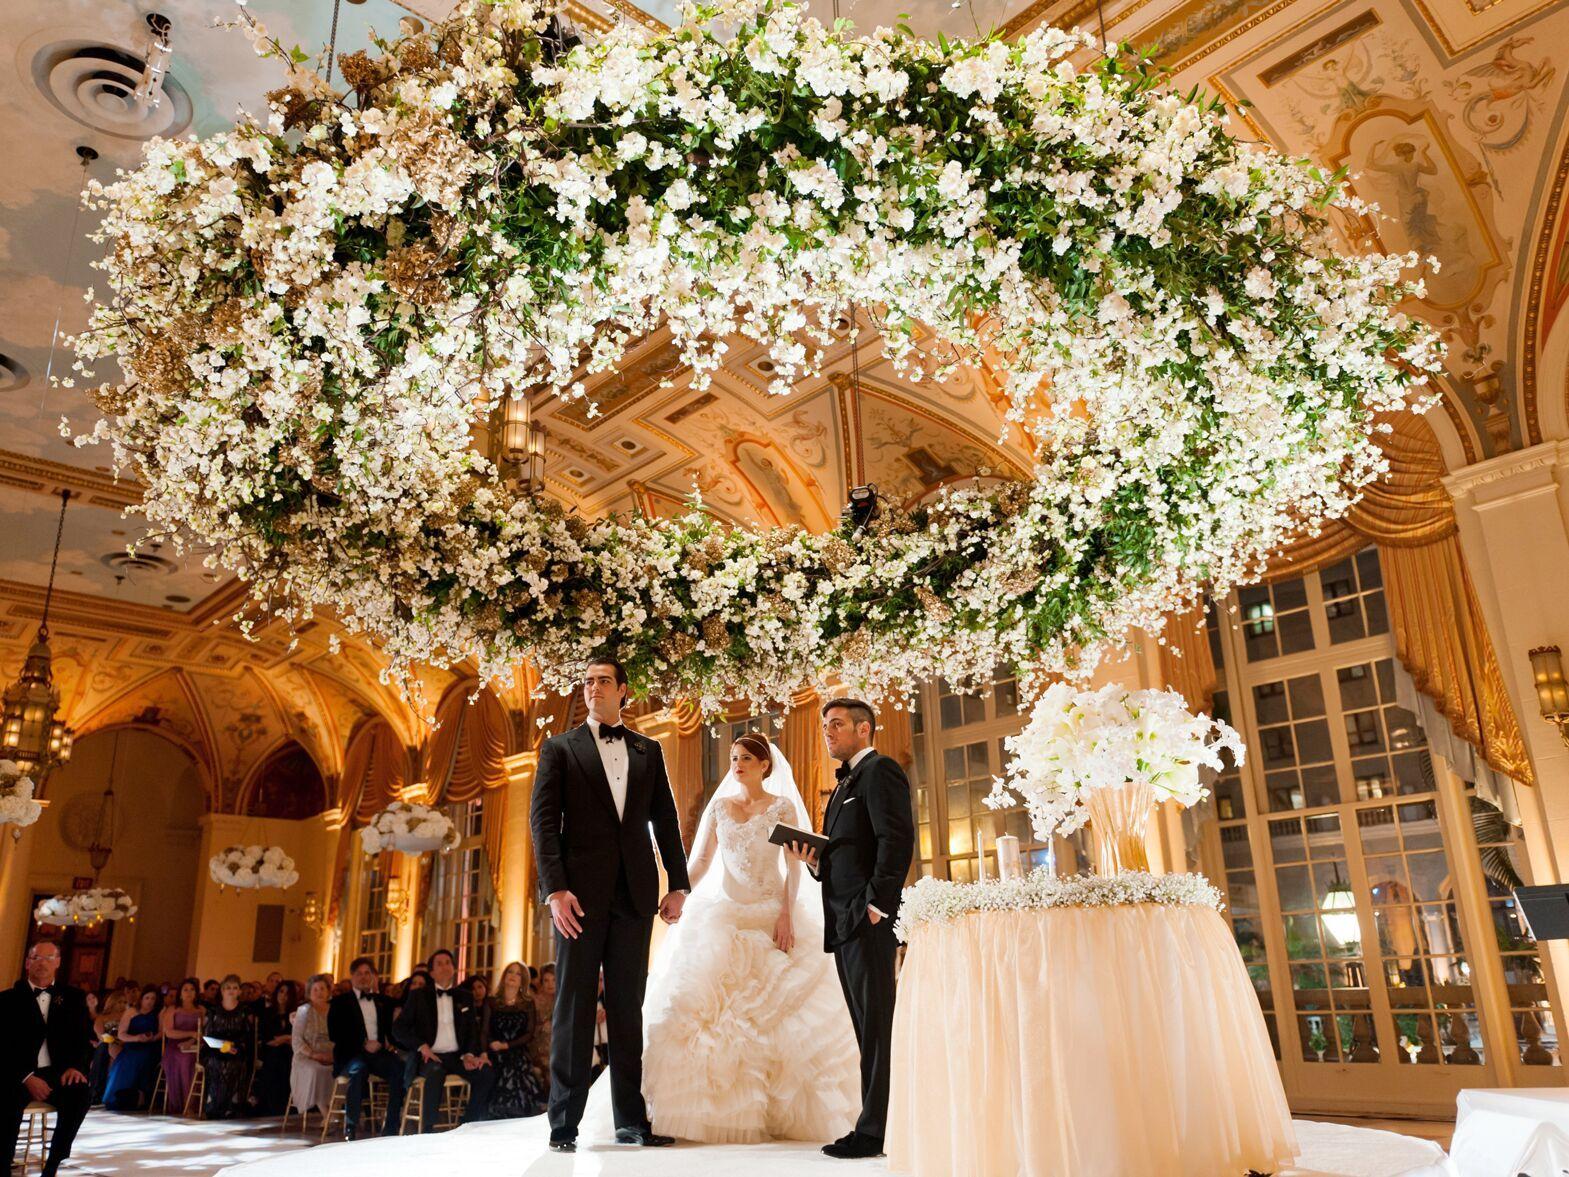 Average Cost Of Wedding Flowers 2017 Wedding flowers